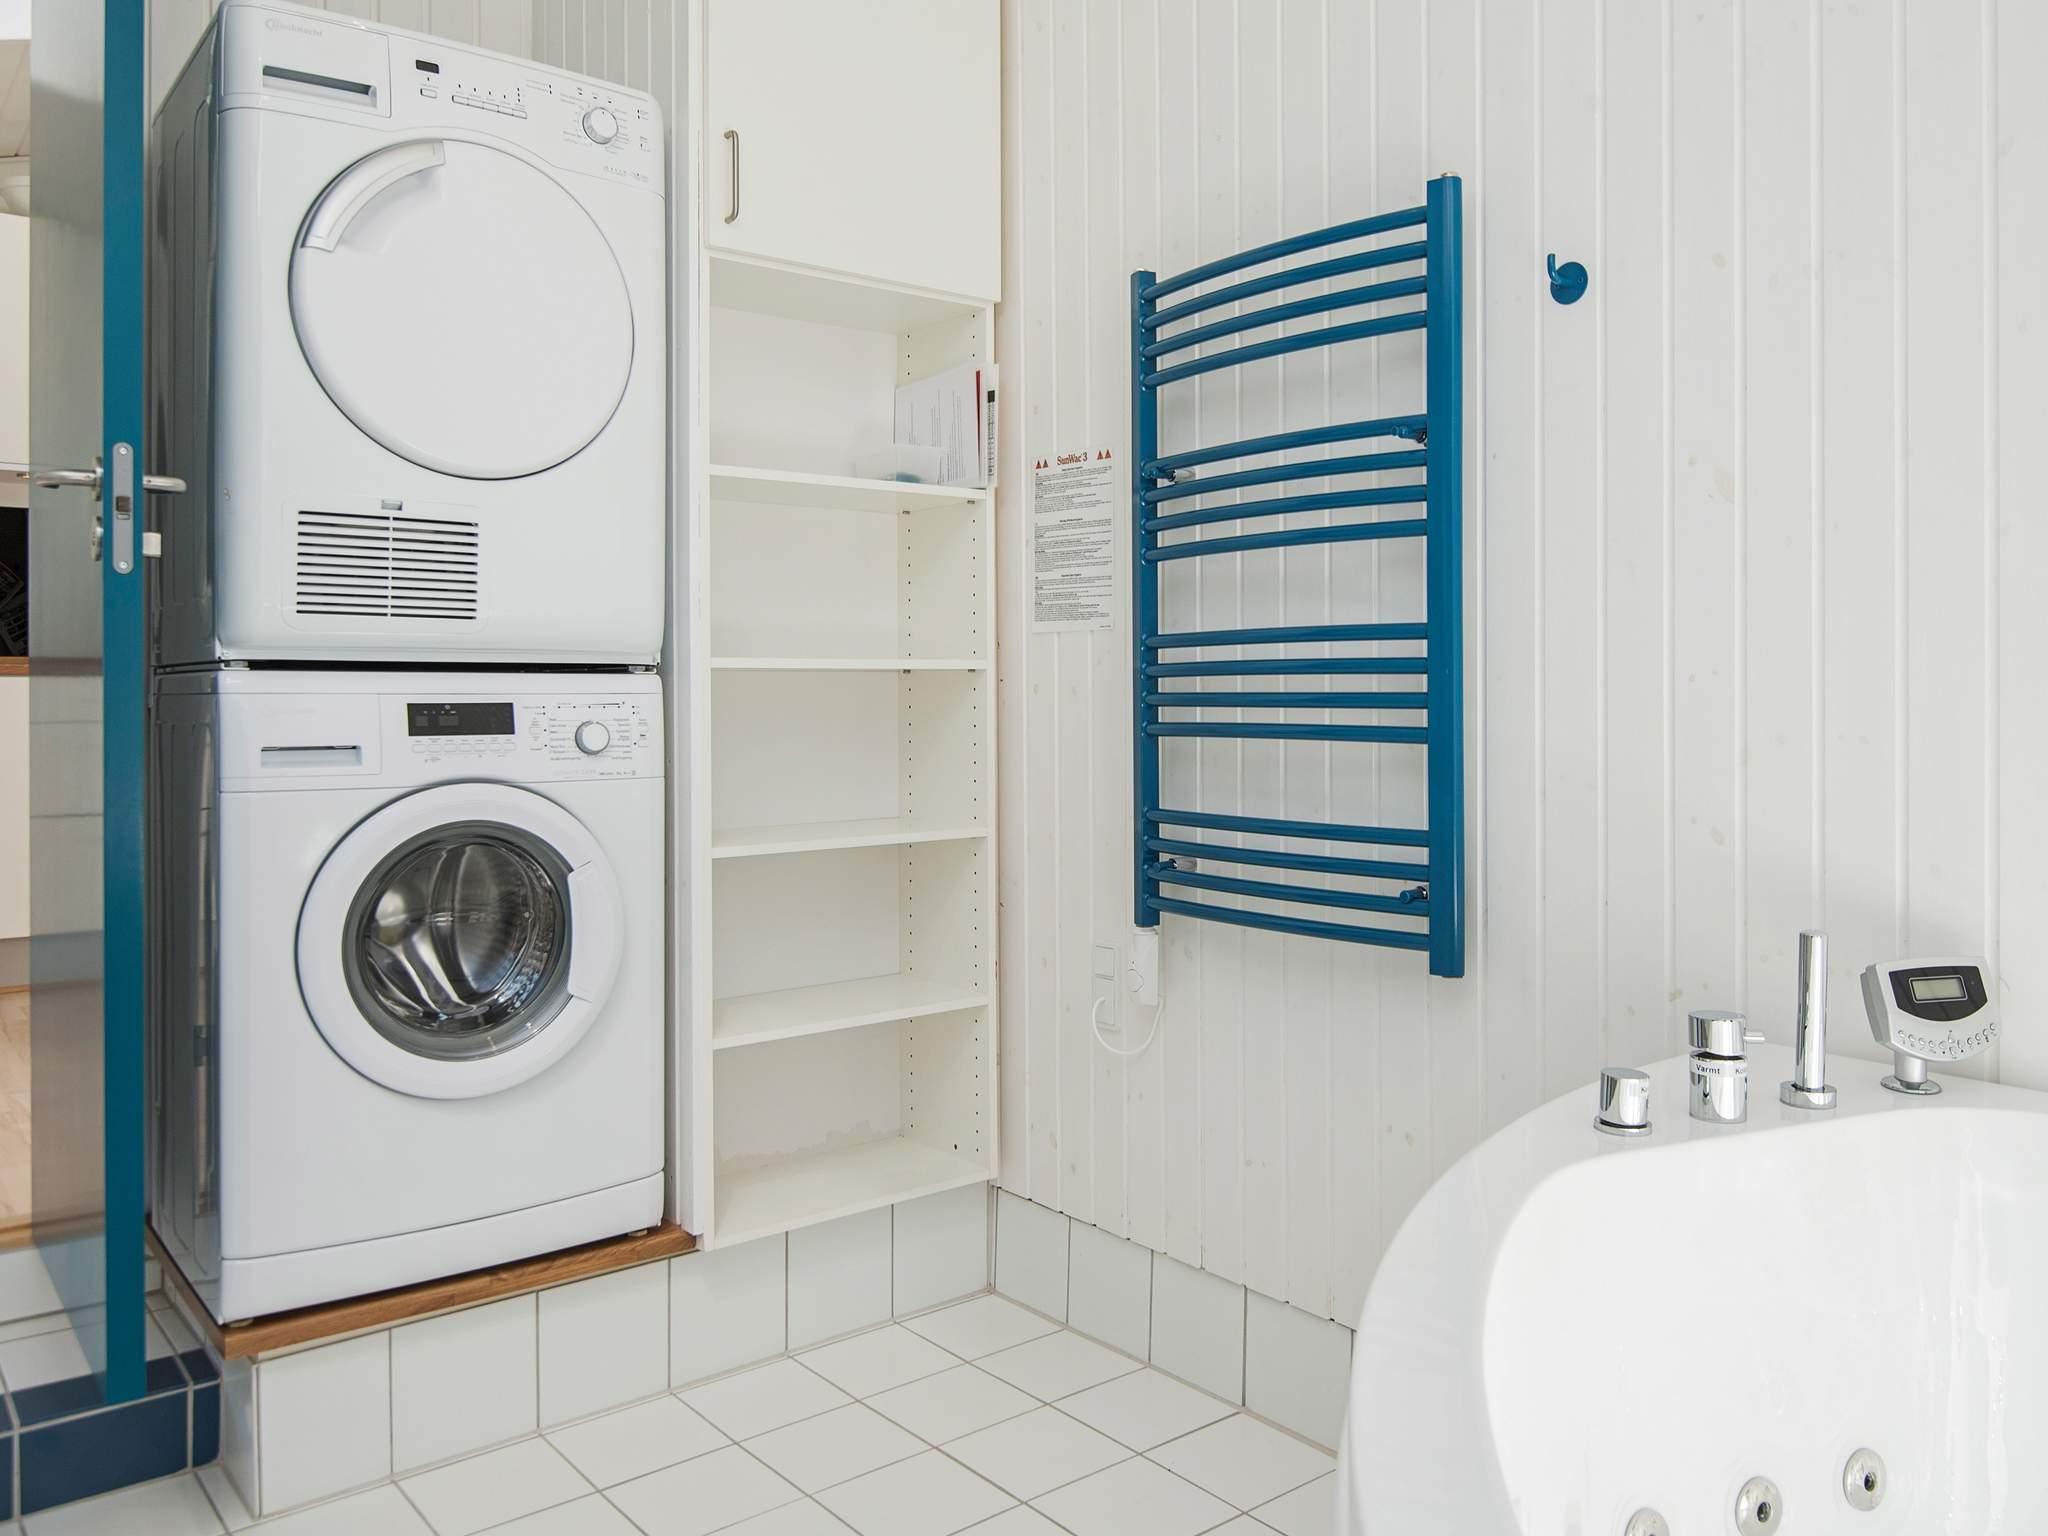 Maison de vacances Helgenæs (978615), Knebel, , Jutland Est, Danemark, image 11